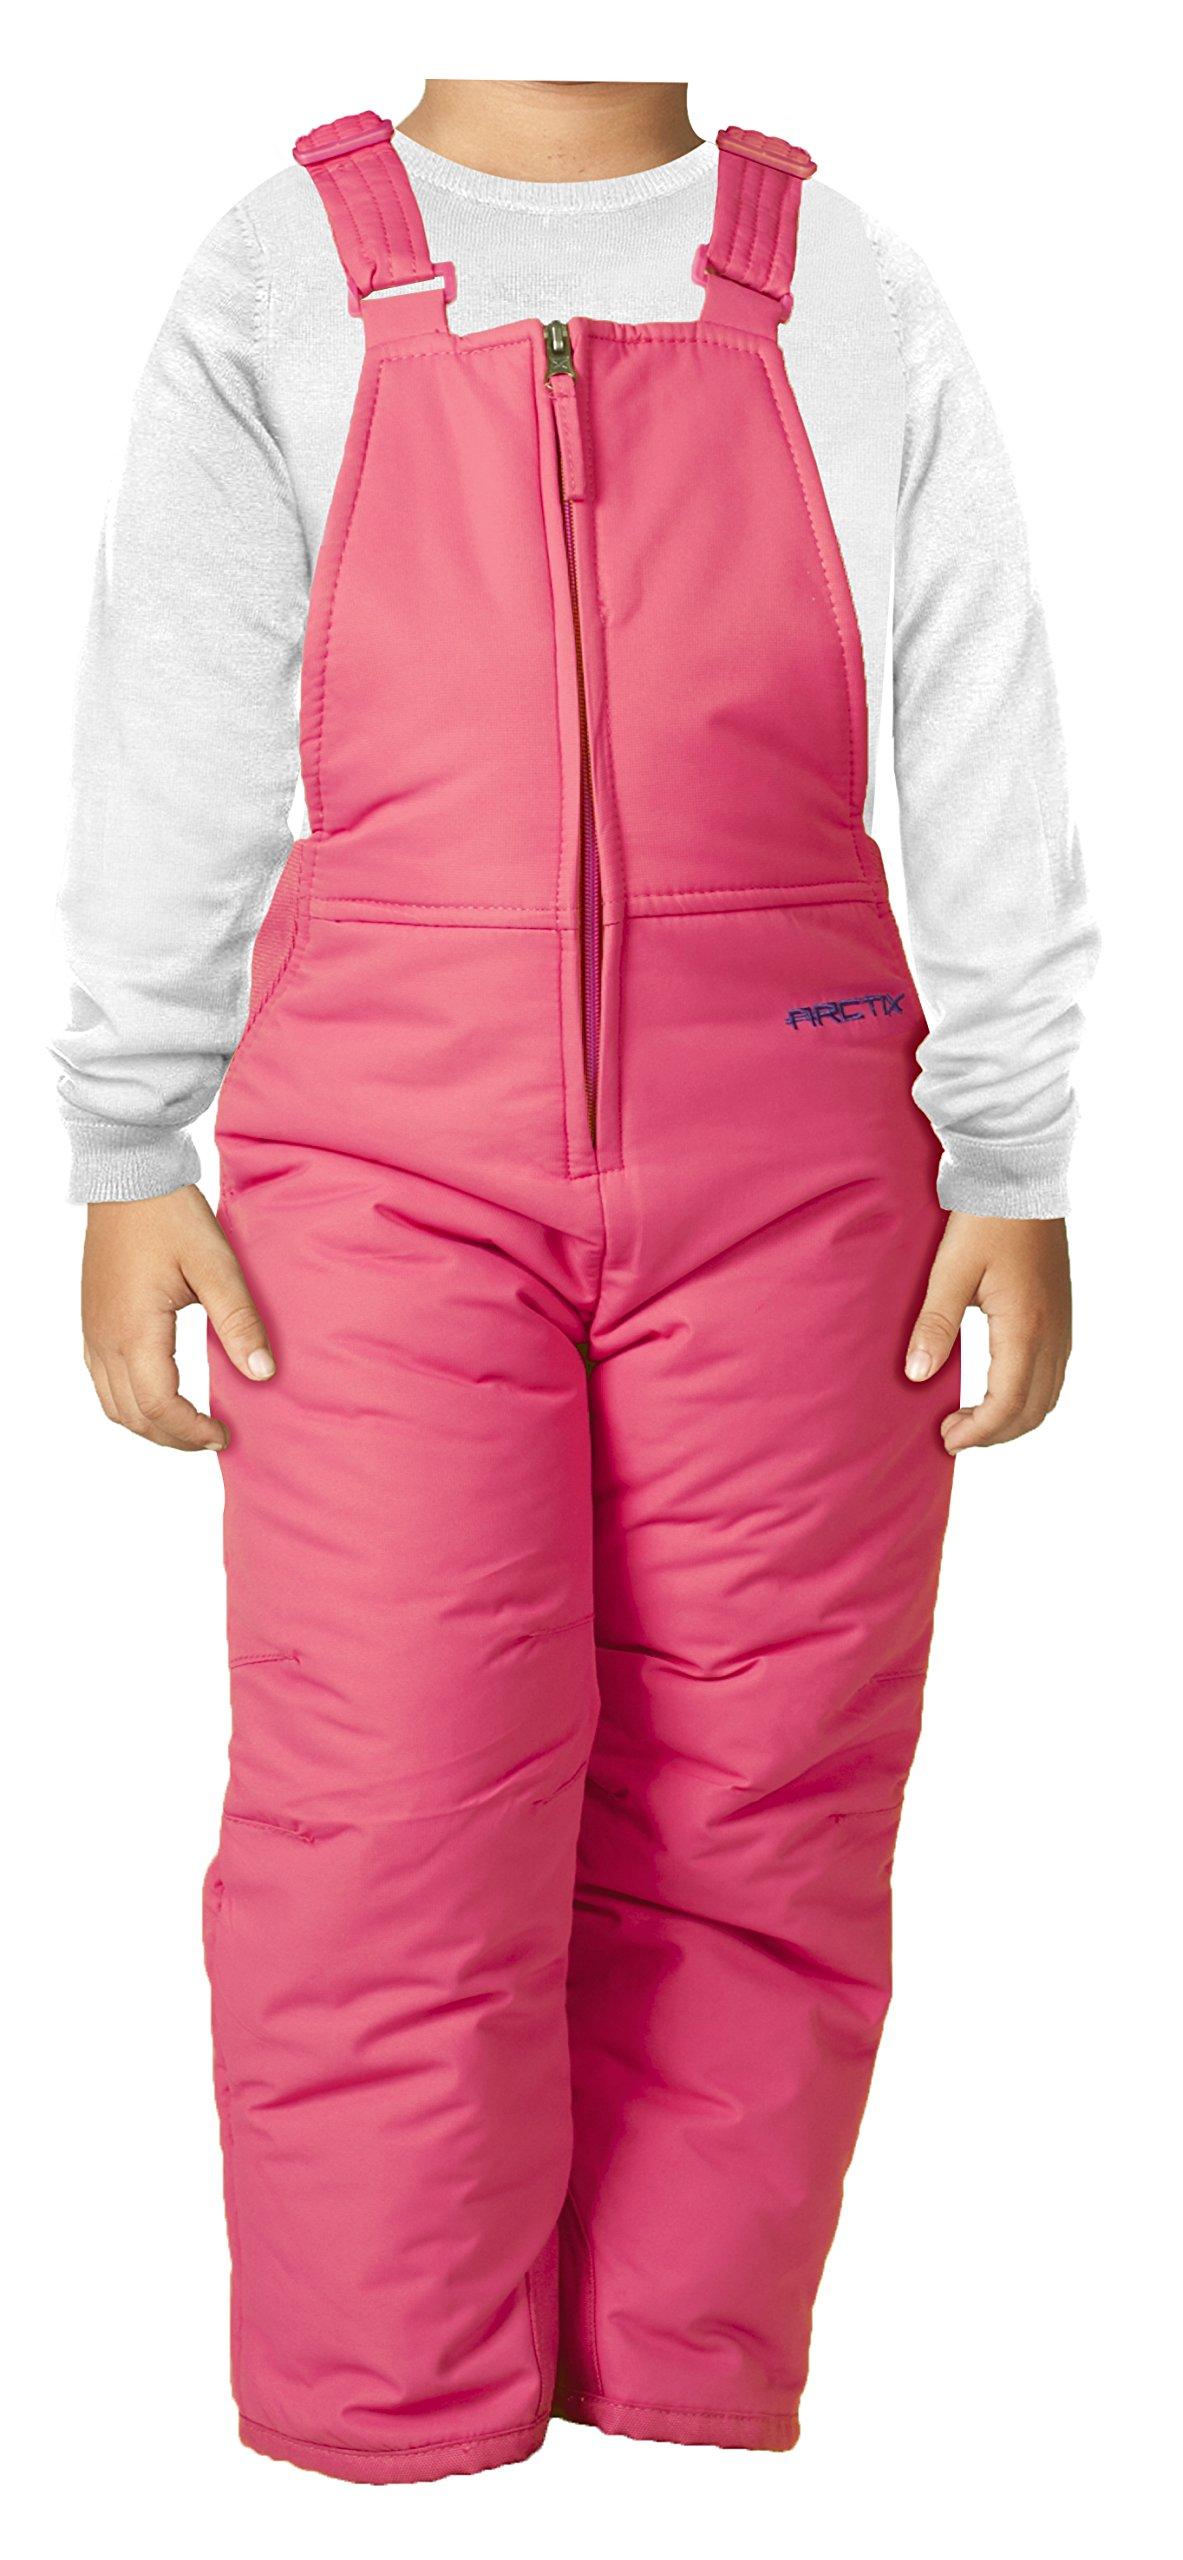 Arctix Infant//Toddler Chest High Snow Bib Overalls